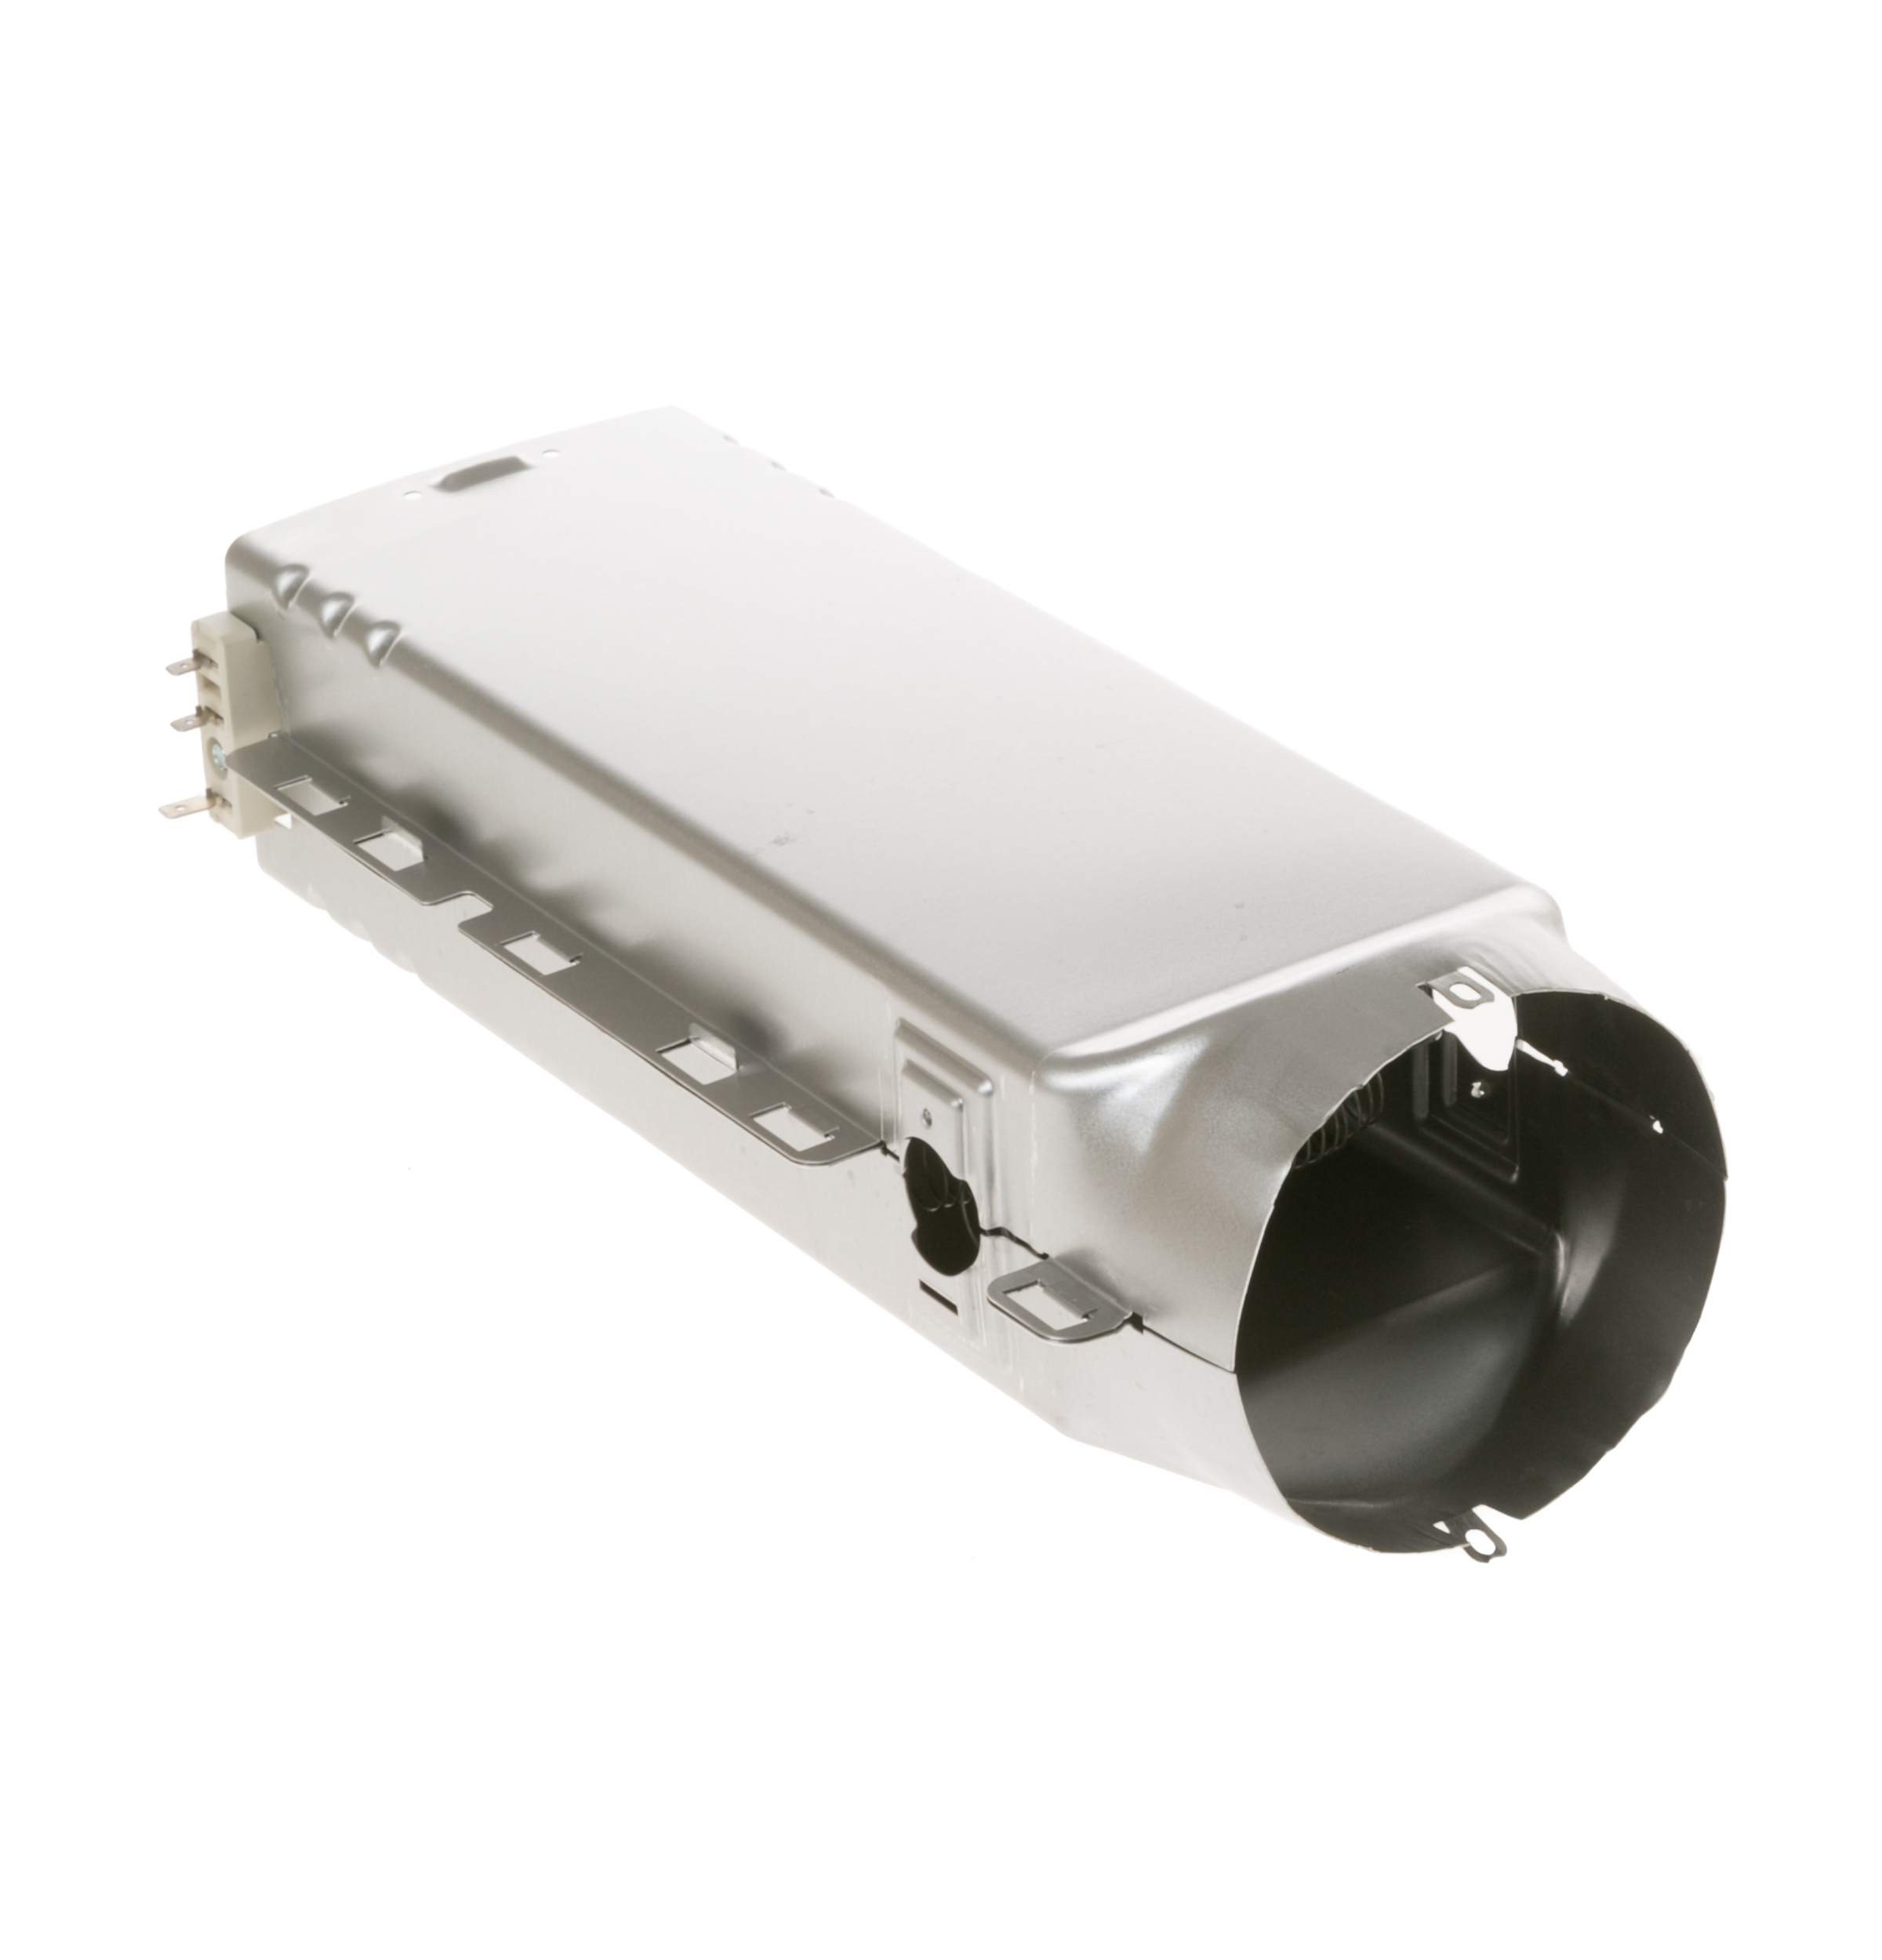 GE GTD81ESSJ0WS Heating Element Assembly